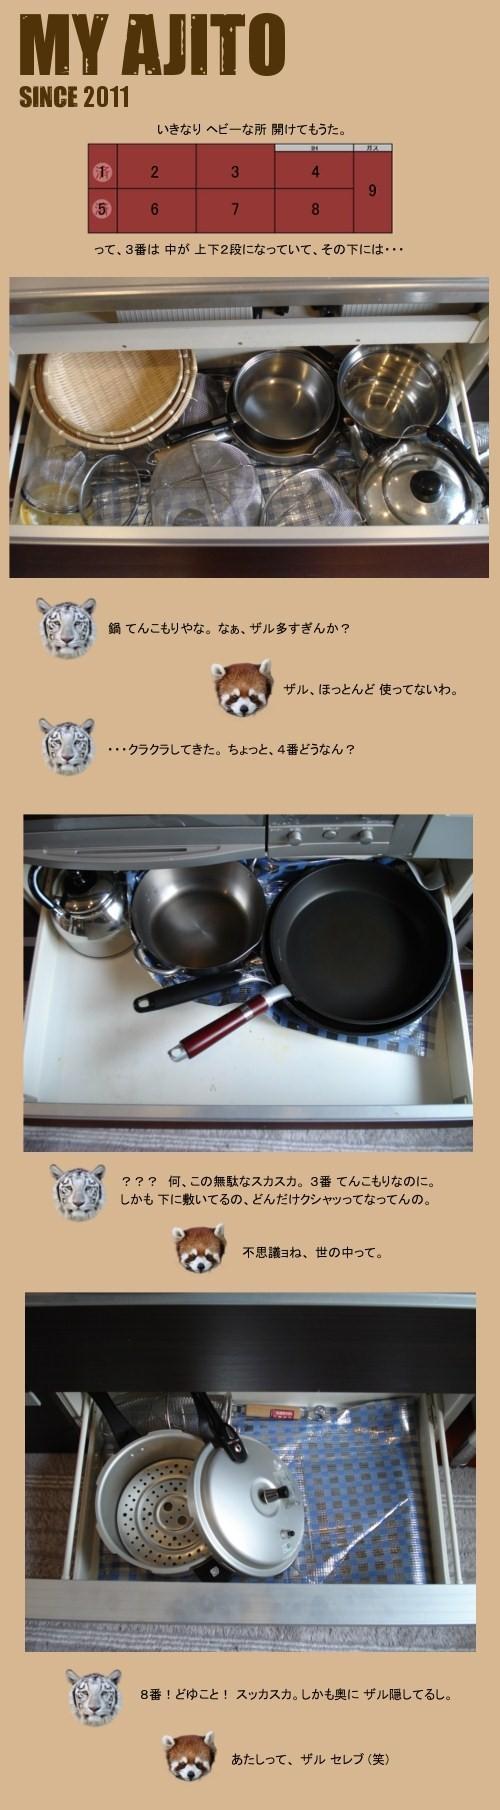 ayan_2nd_3.jpg